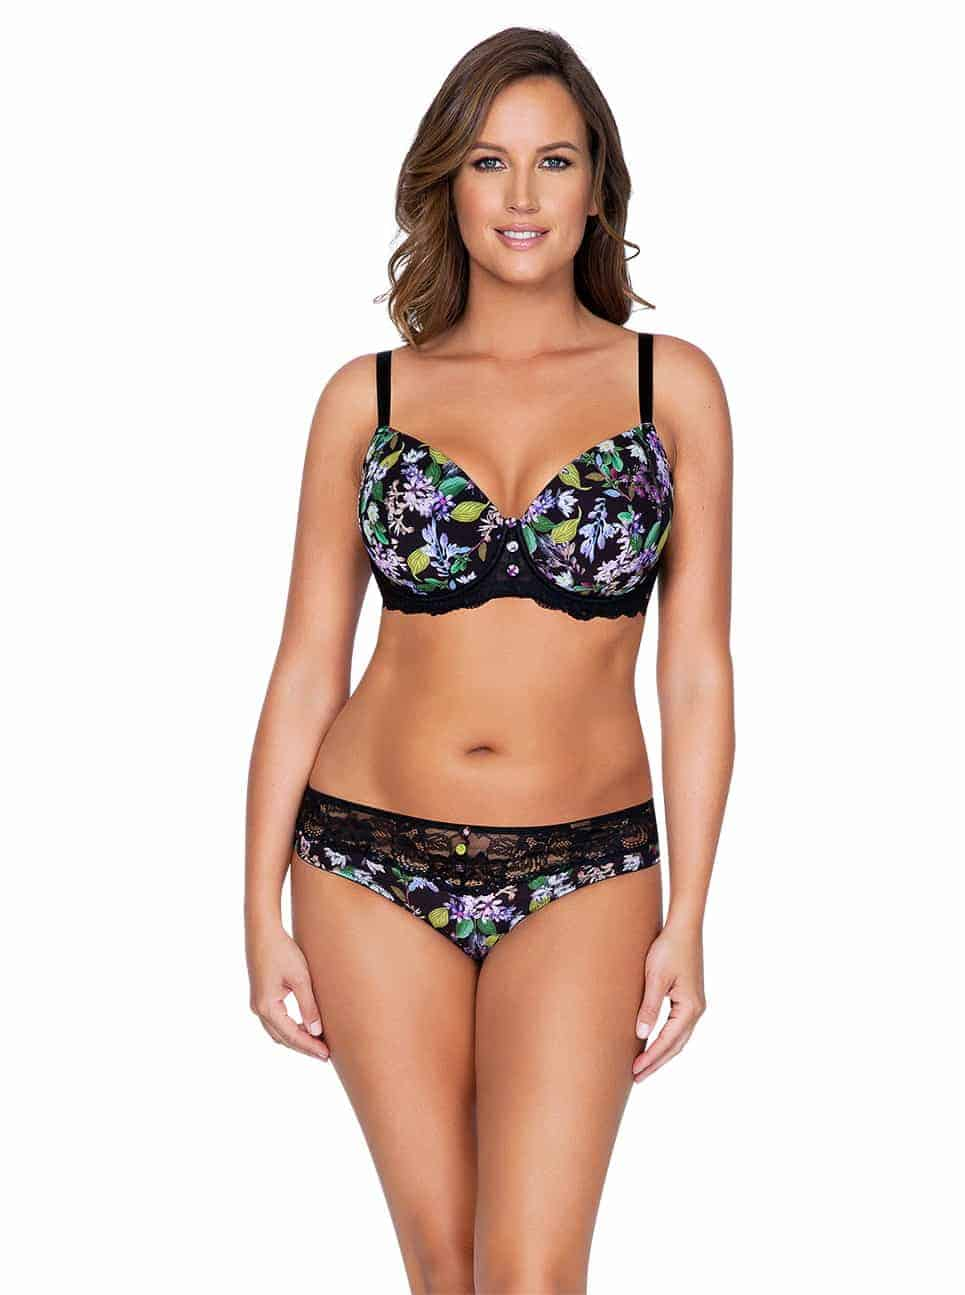 Ava P5371 PaddedBra P5373 BikiniFront 1 - Ava Bikini - Black Floral - P5373